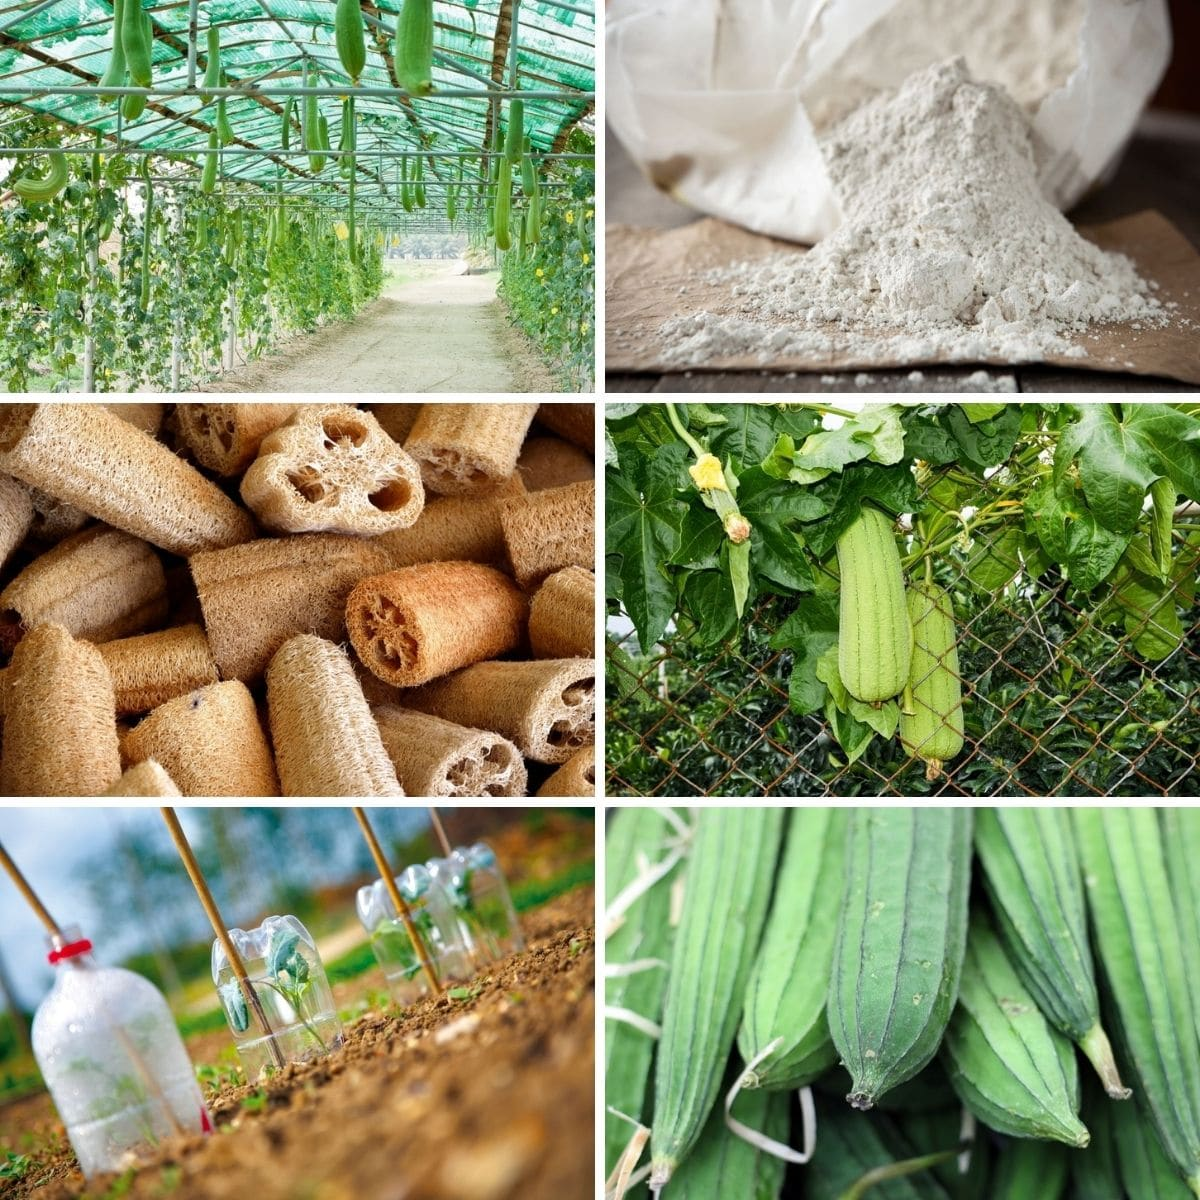 Loofah growth photos collage